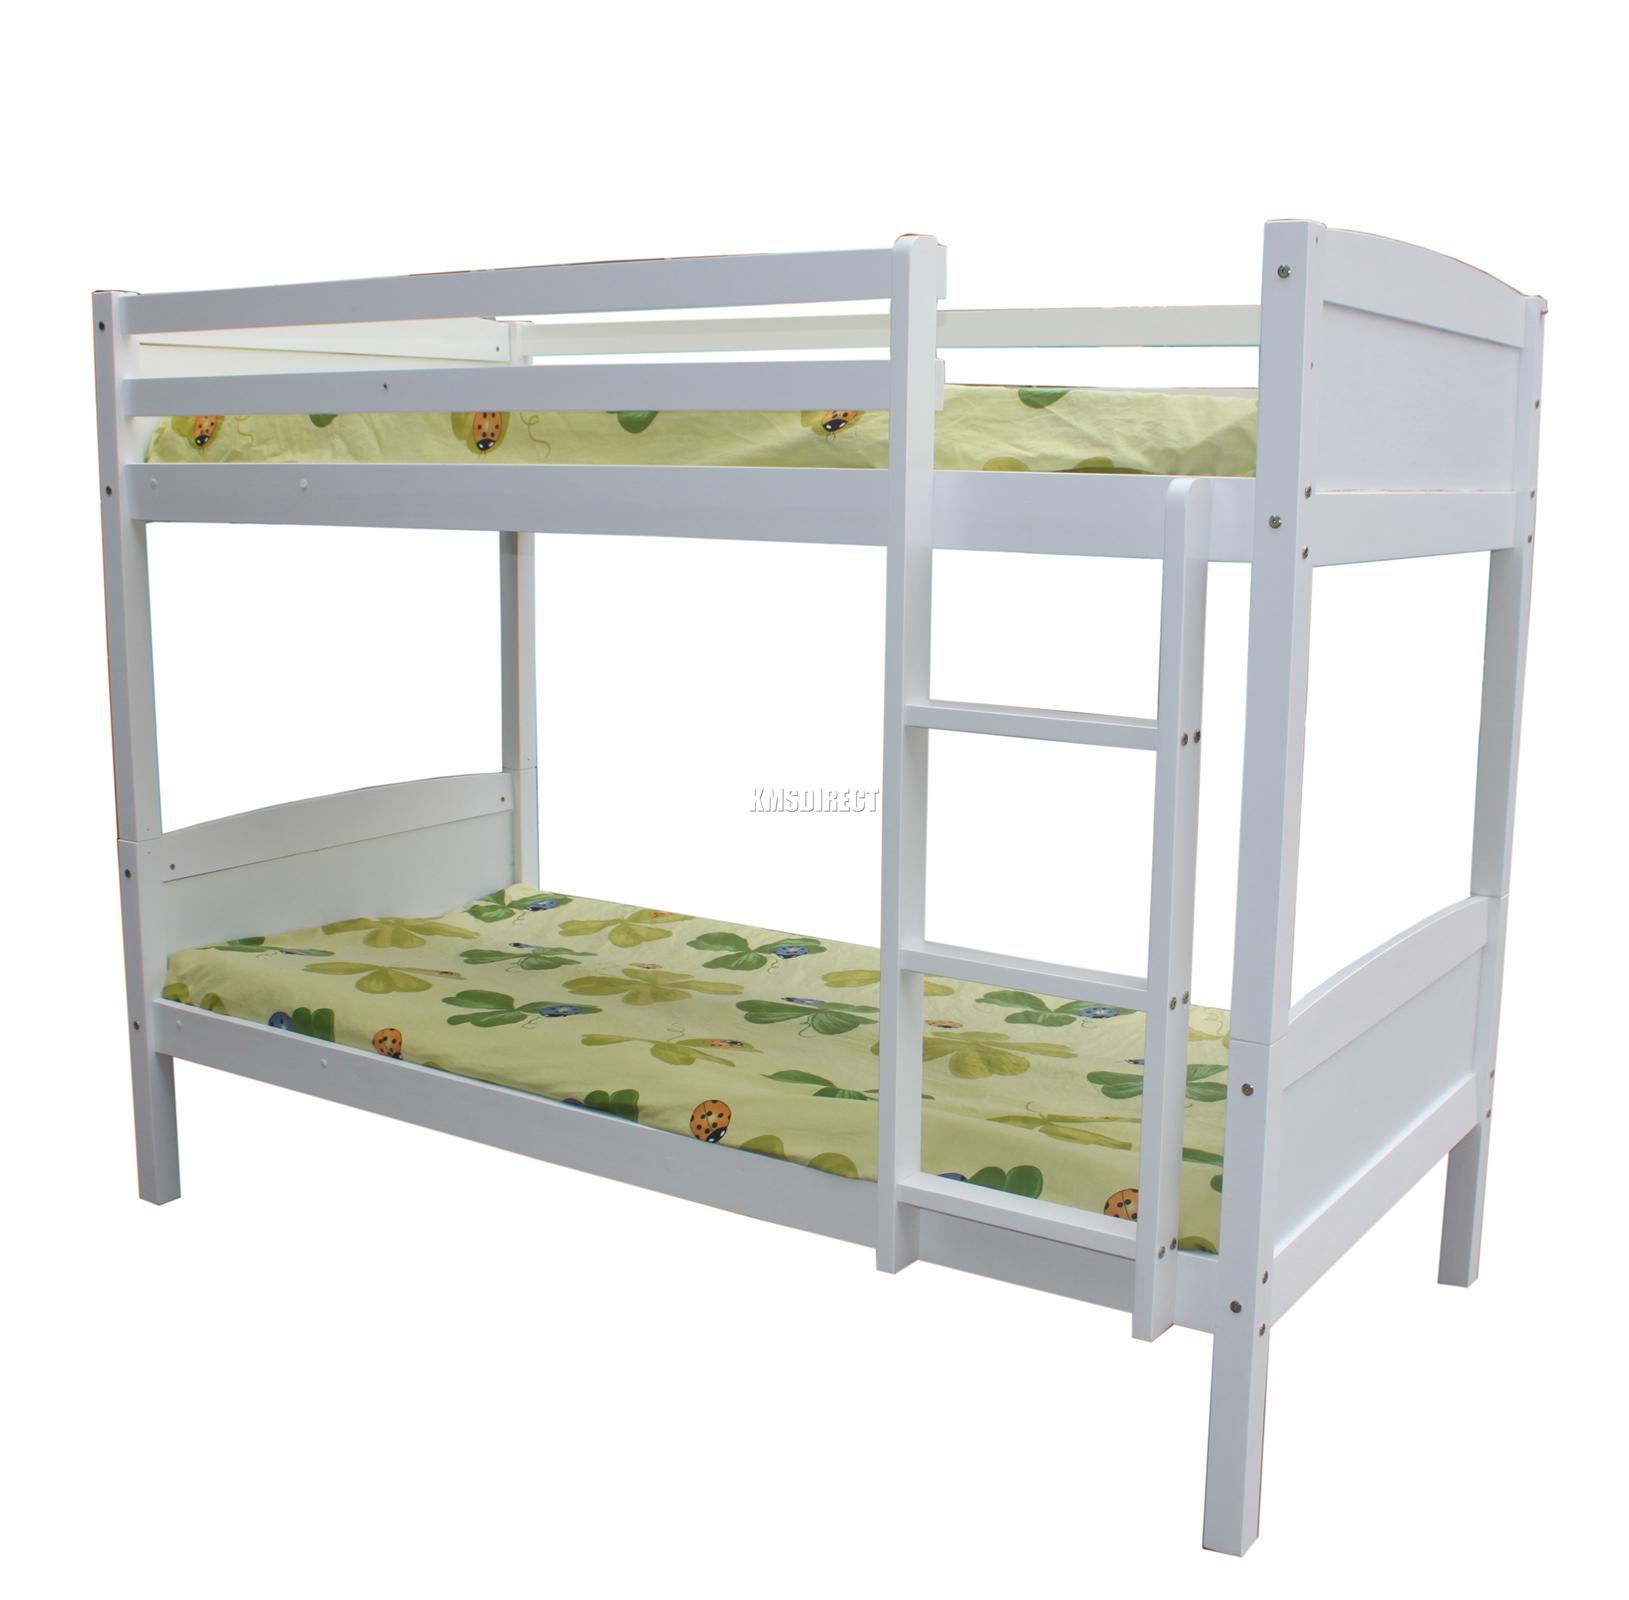 Foxhunter bunk bed 3ft wooden frame children sleeper no for White bunk bed frame